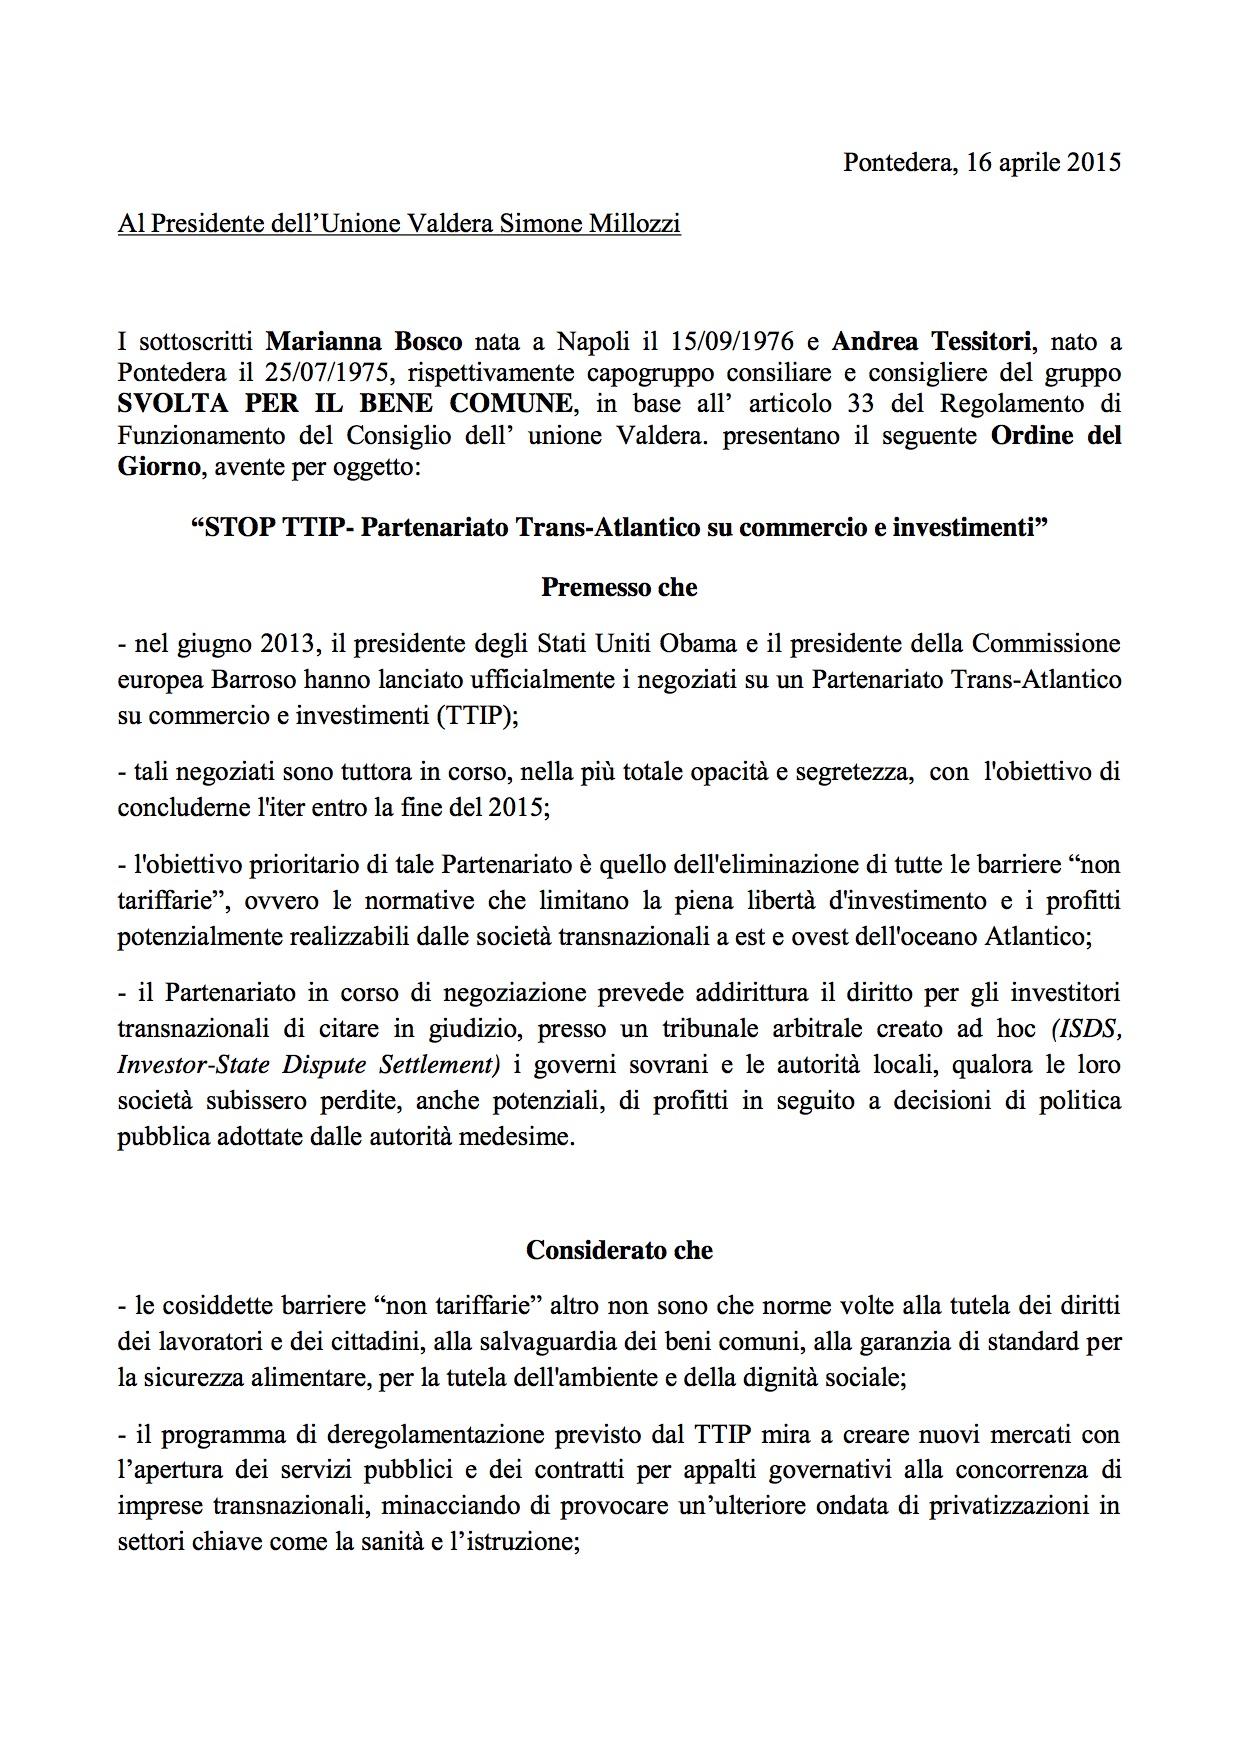 TTIP UNIONE 1